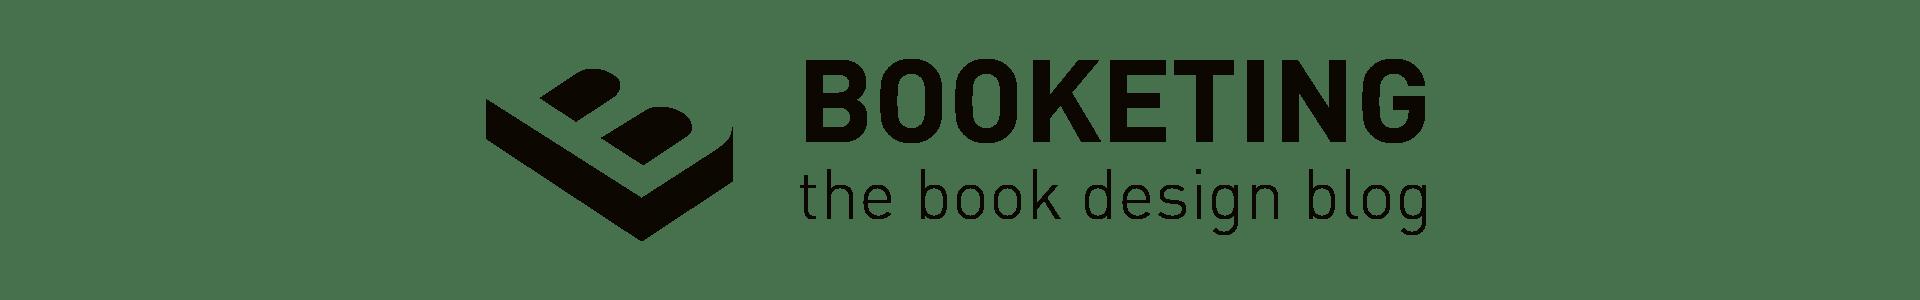 Booketing